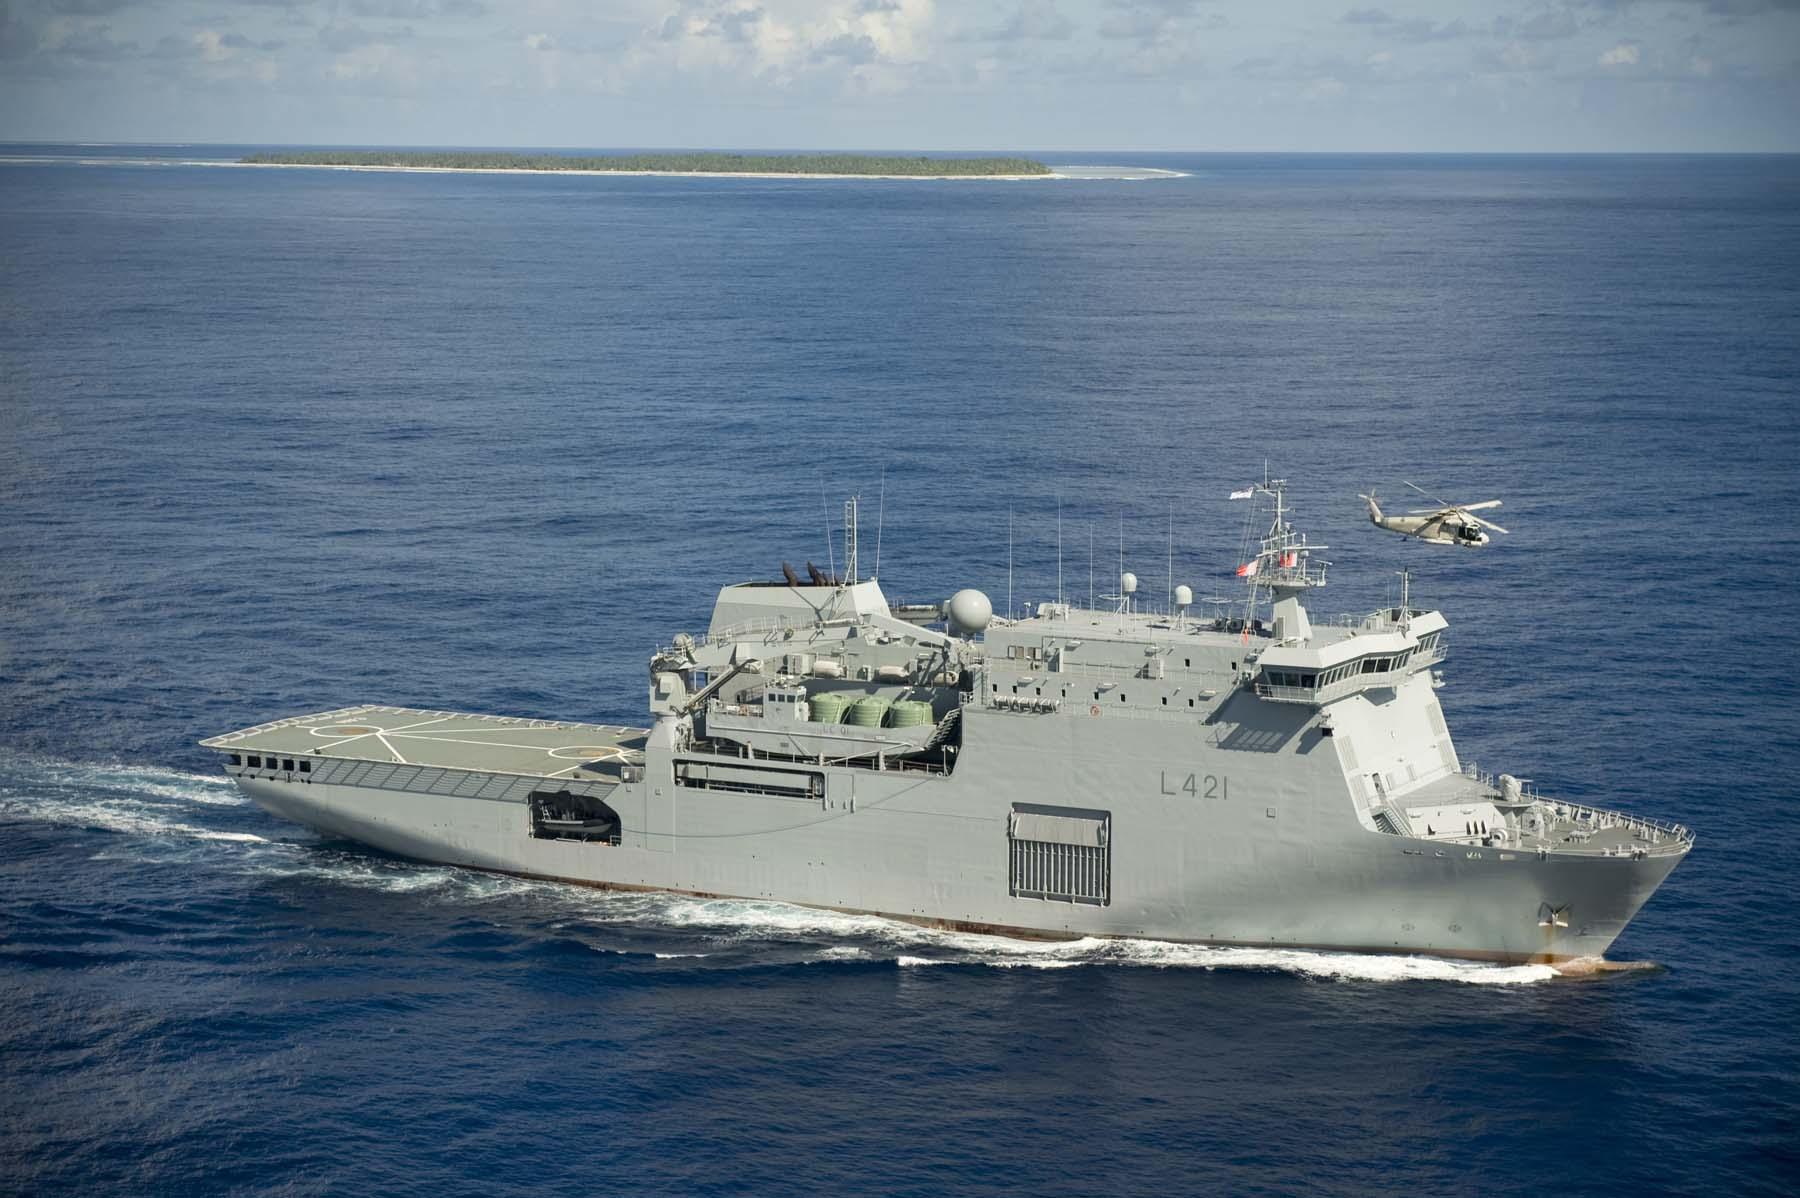 Albion Castle Strategic Sealift Hmnzs Canterbury L421 Largest Ship In